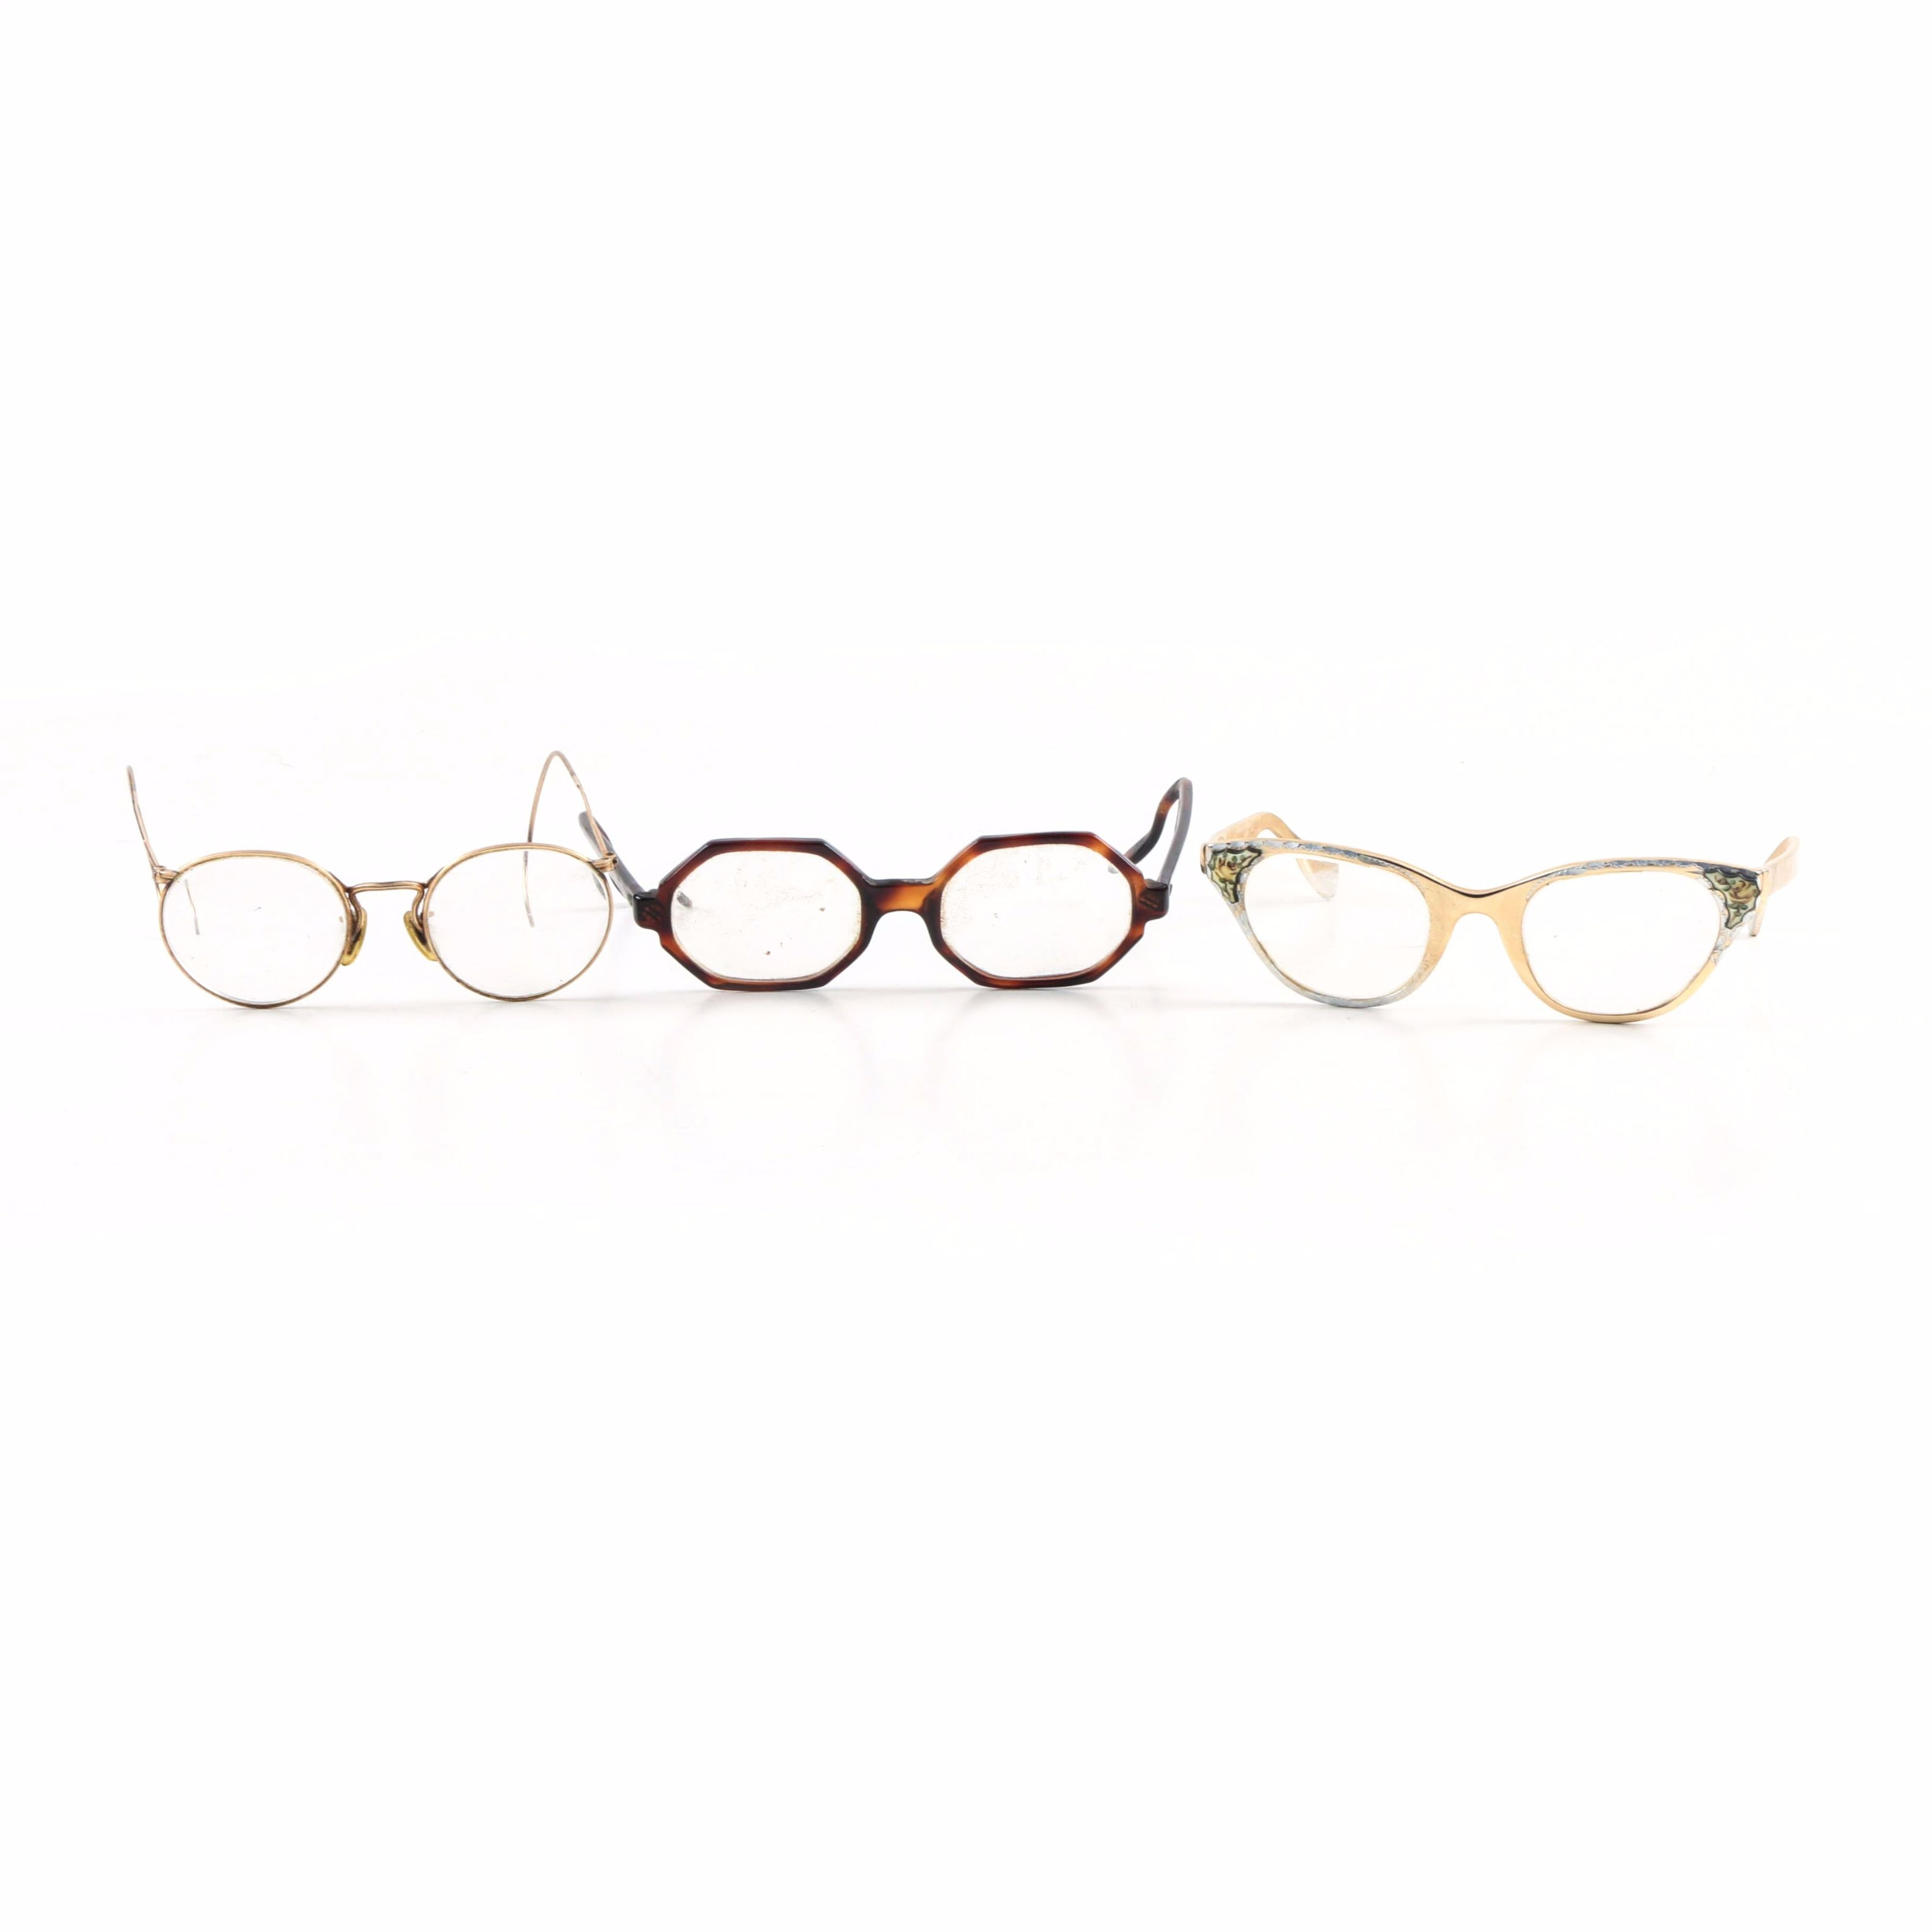 Vintage Eyeglasses Including Tura